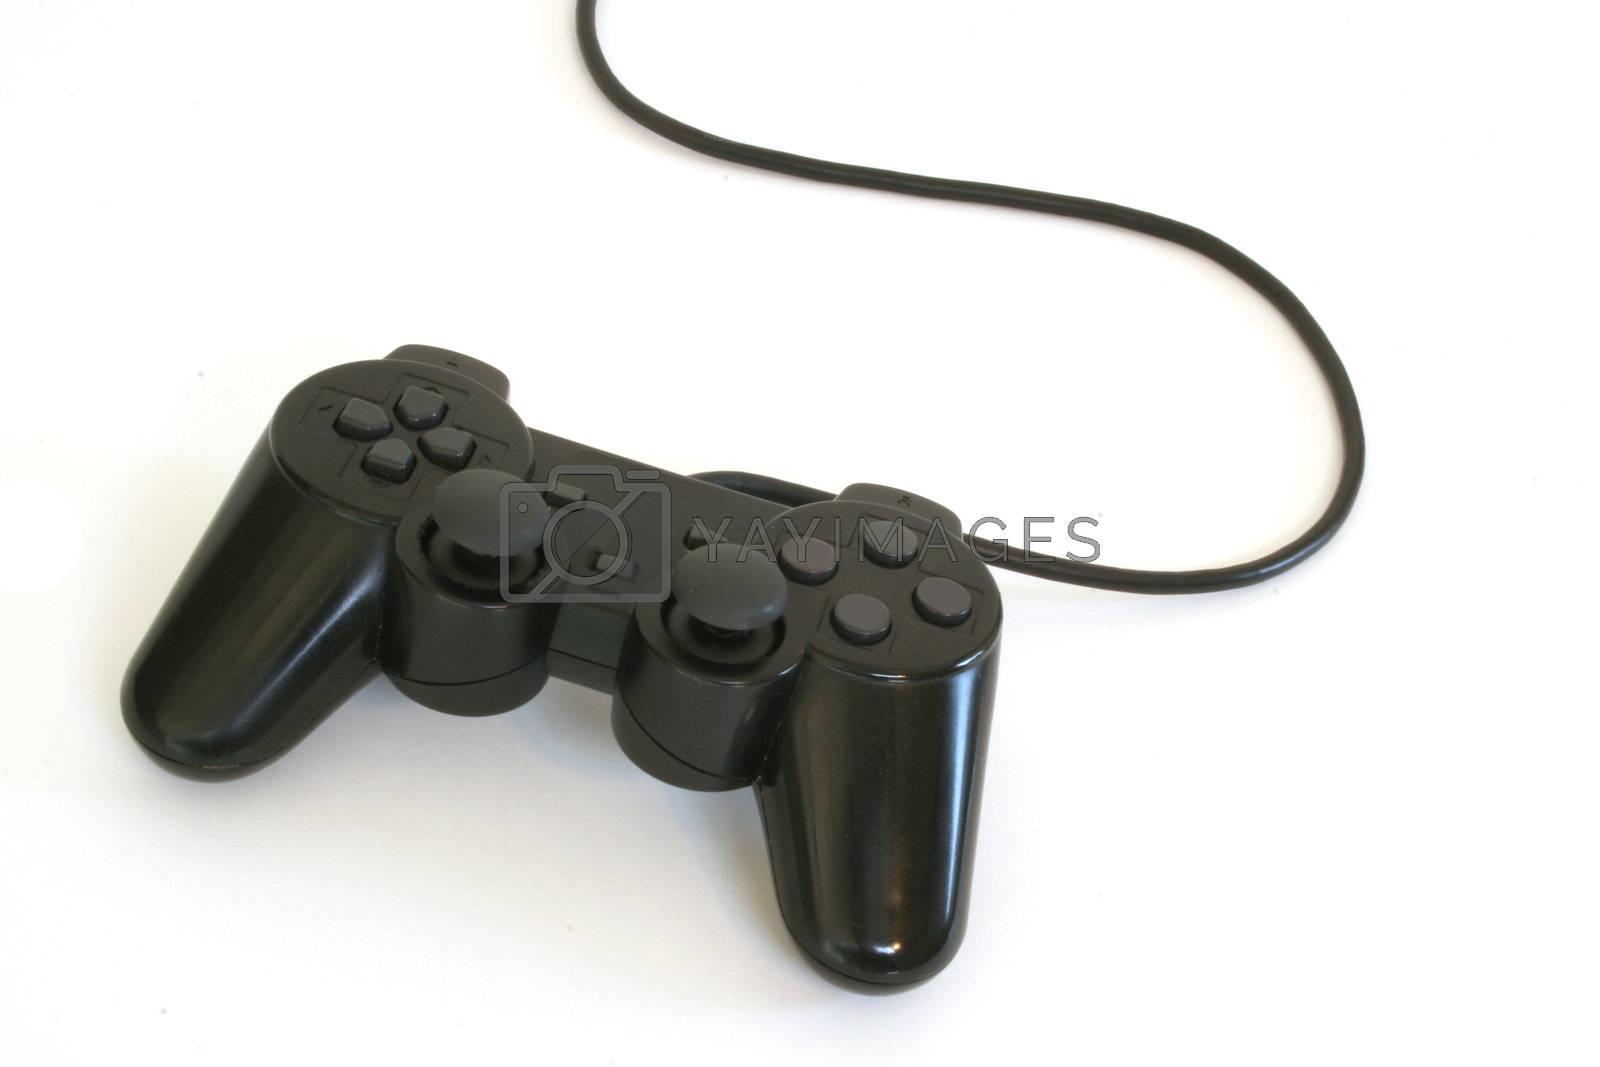 Game Controller by dbvirago